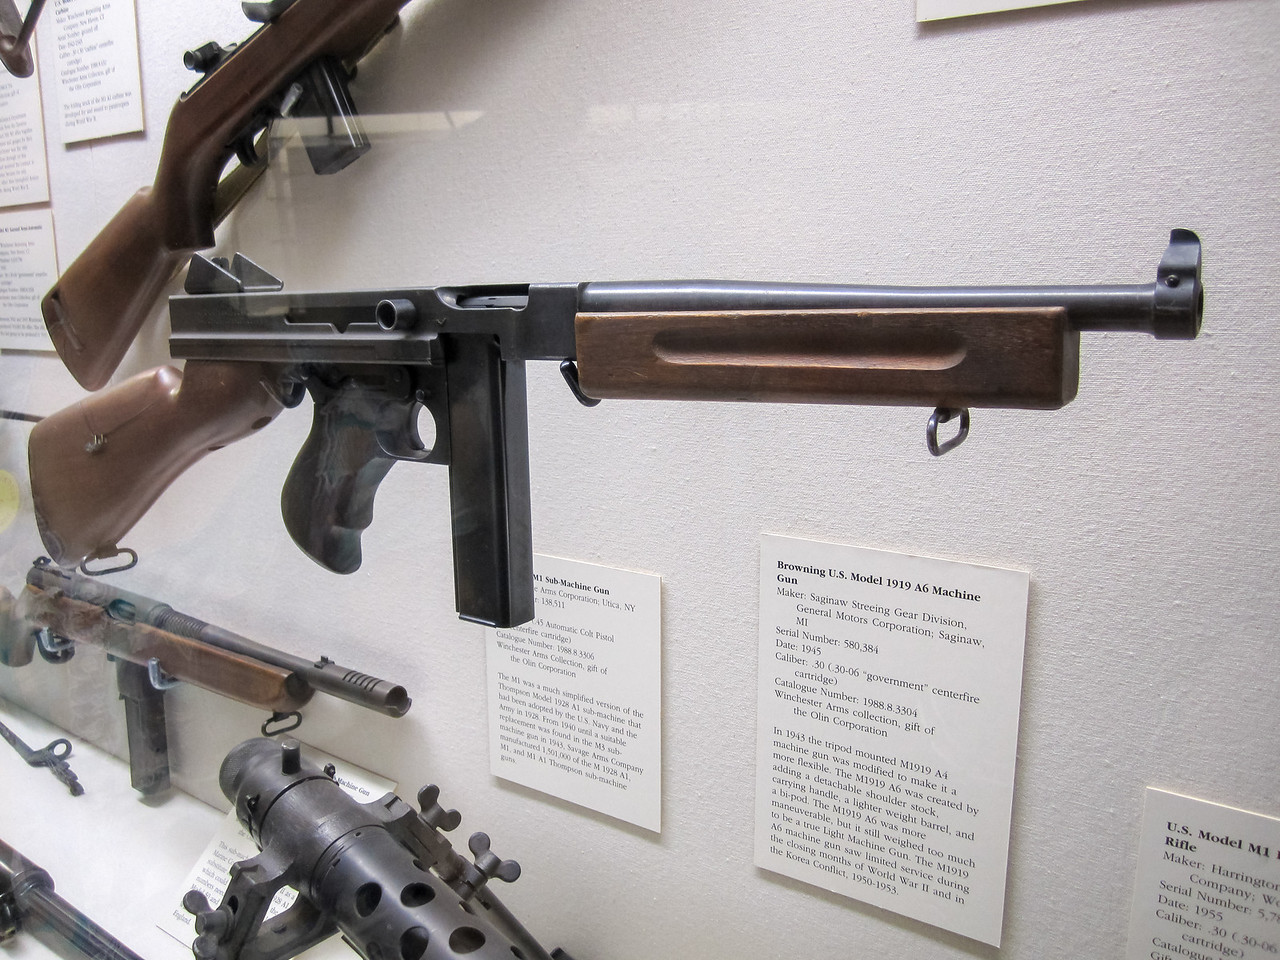 Browning M1 Submachine Gun, Cody Firearms Museum, Buffalo Bill Historical Center